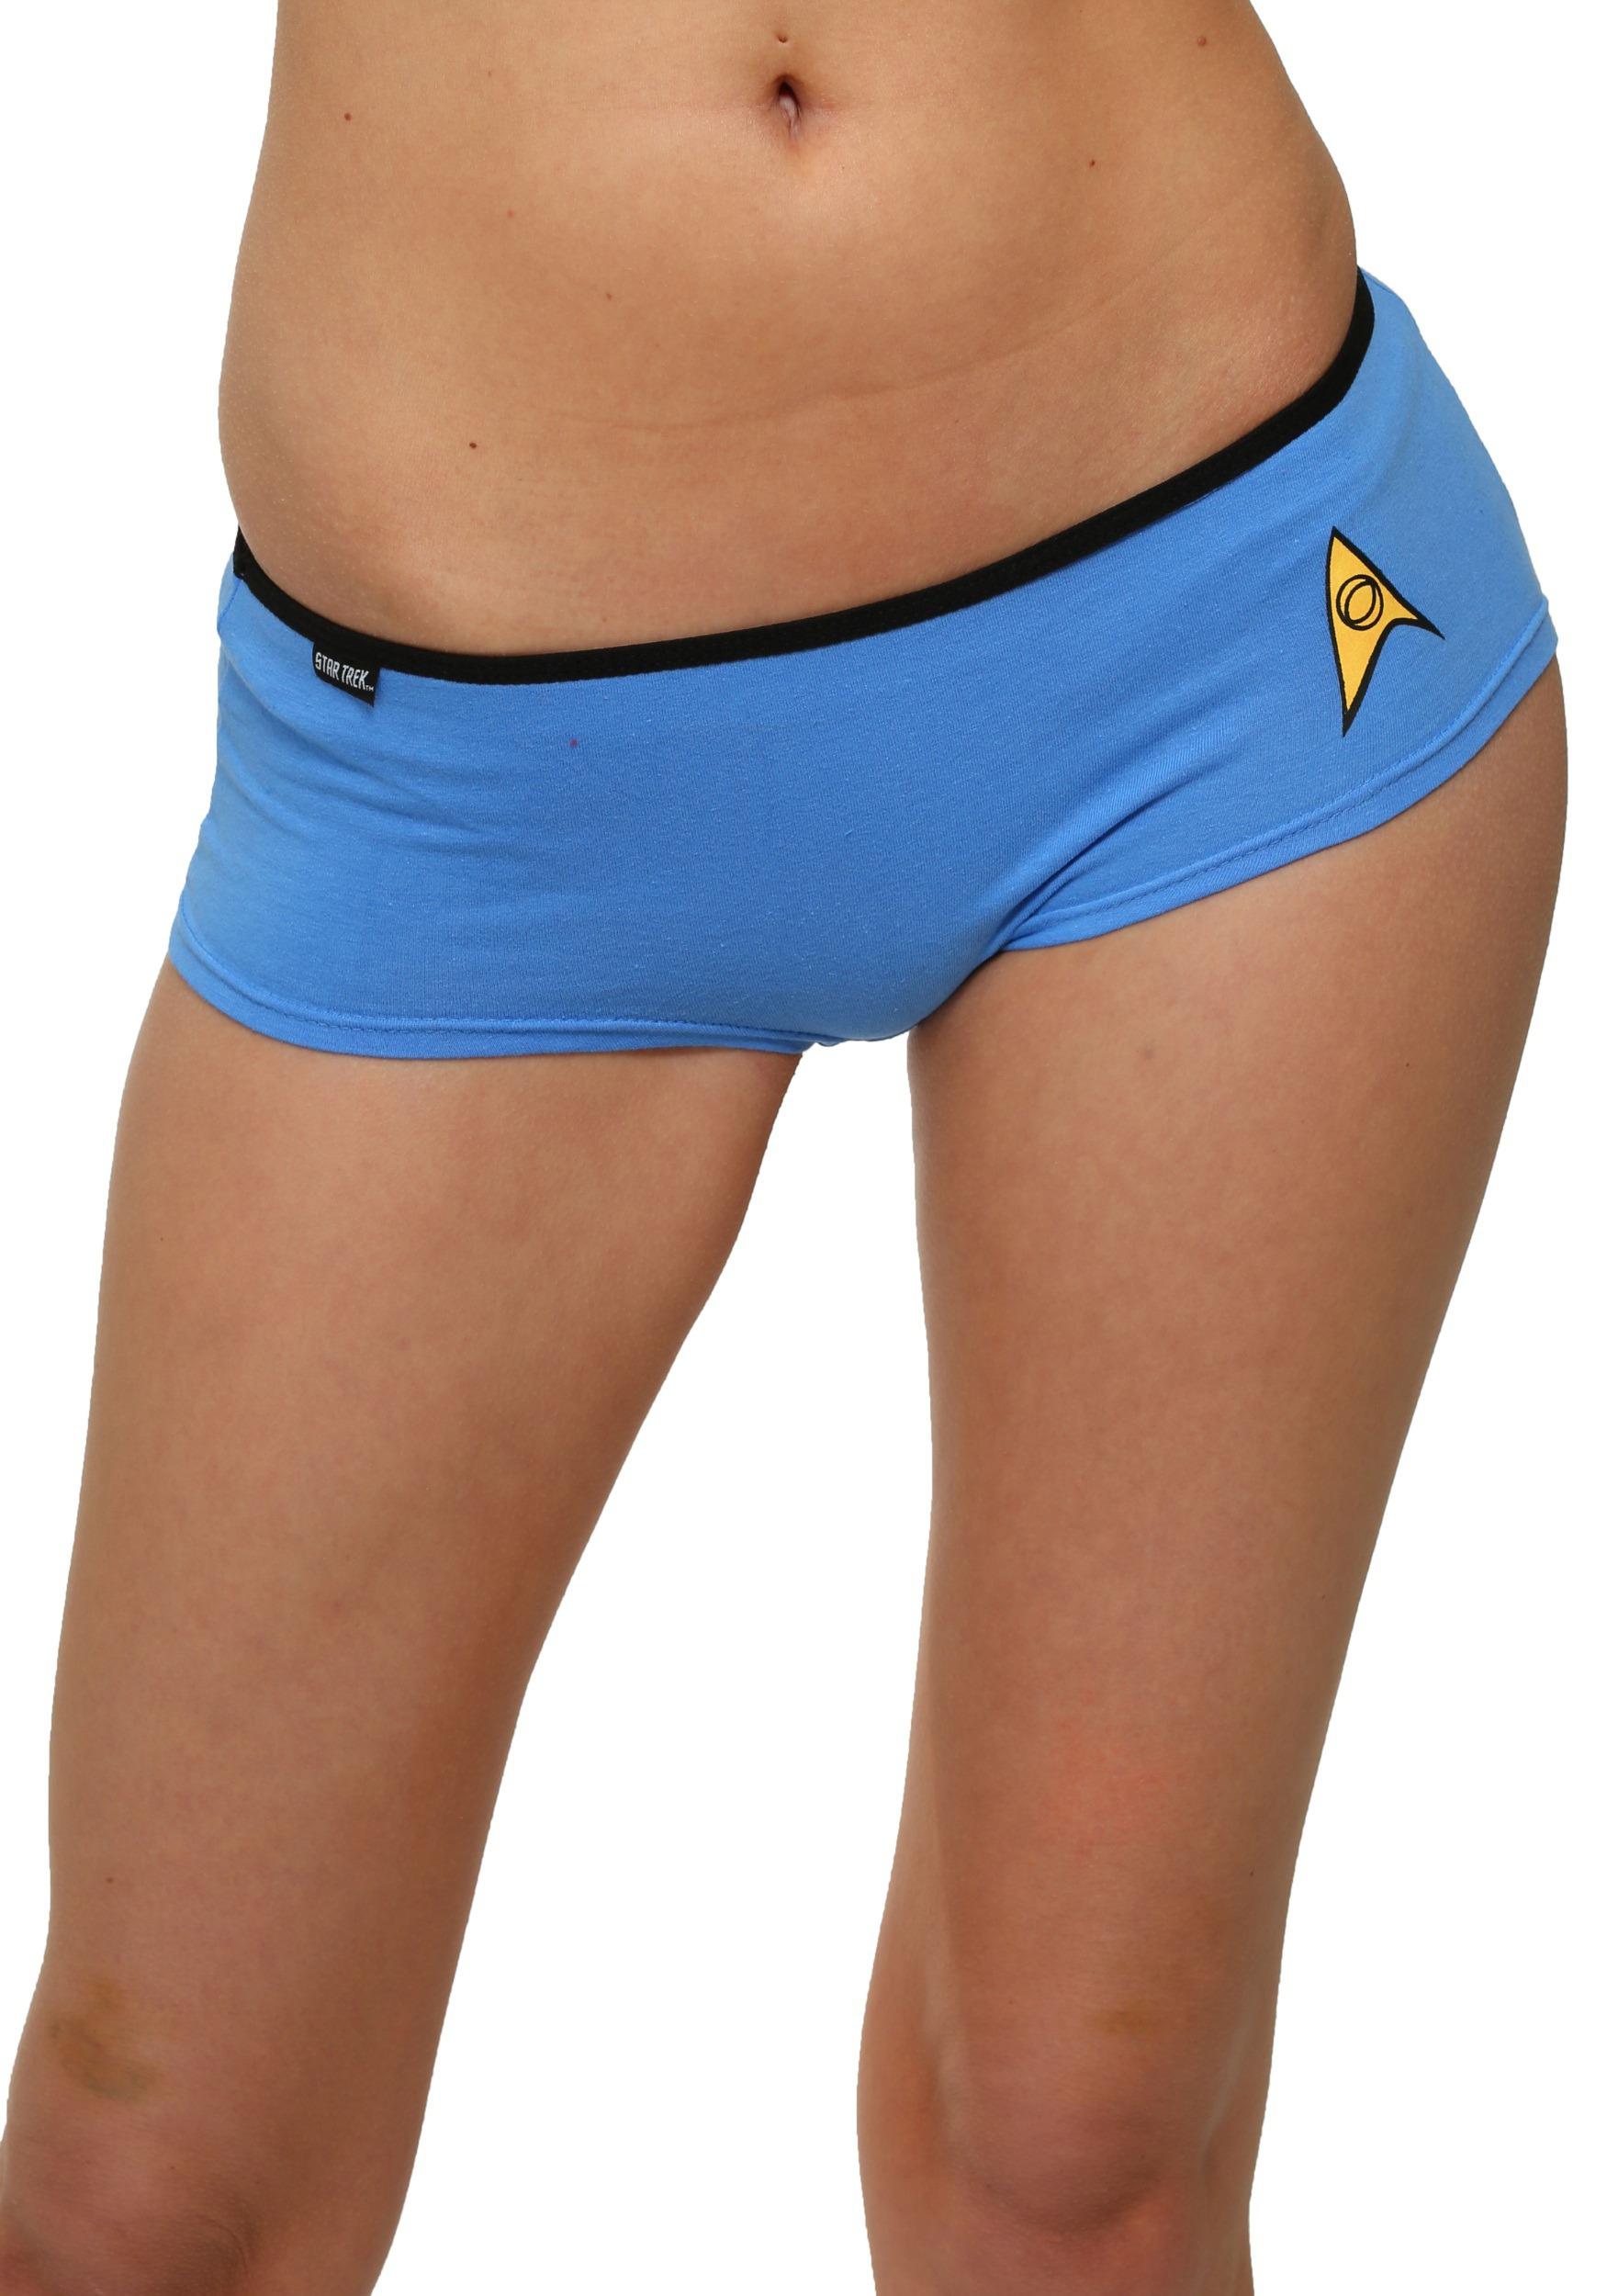 4adf1ac71a Star Trek Women s Panties 3 Pack 1